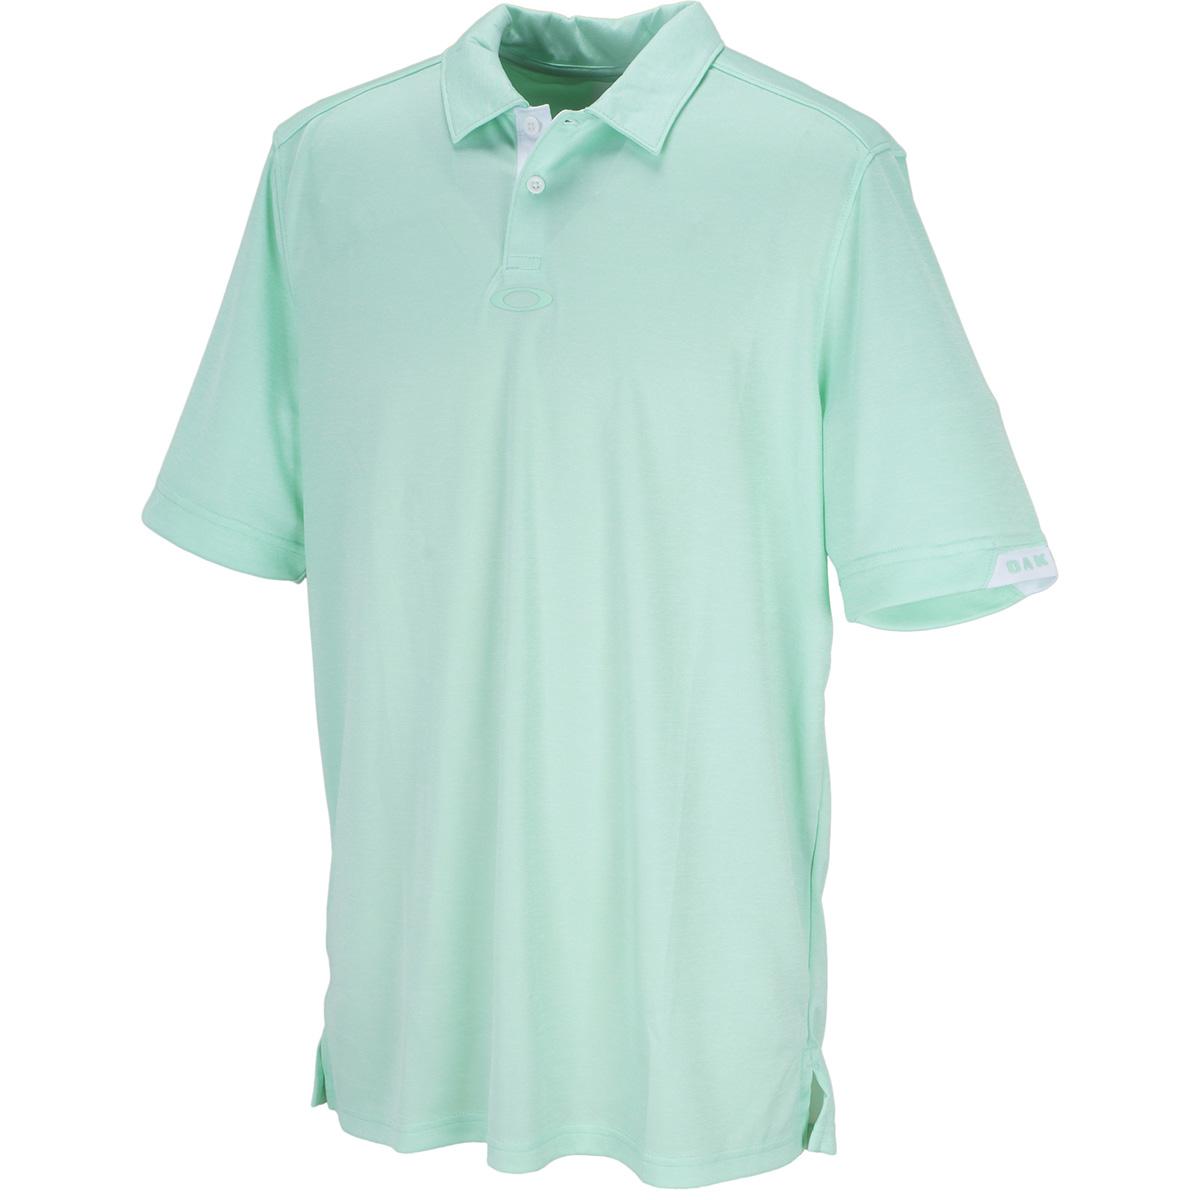 GRAVITY 半袖ポロシャツ 2.0